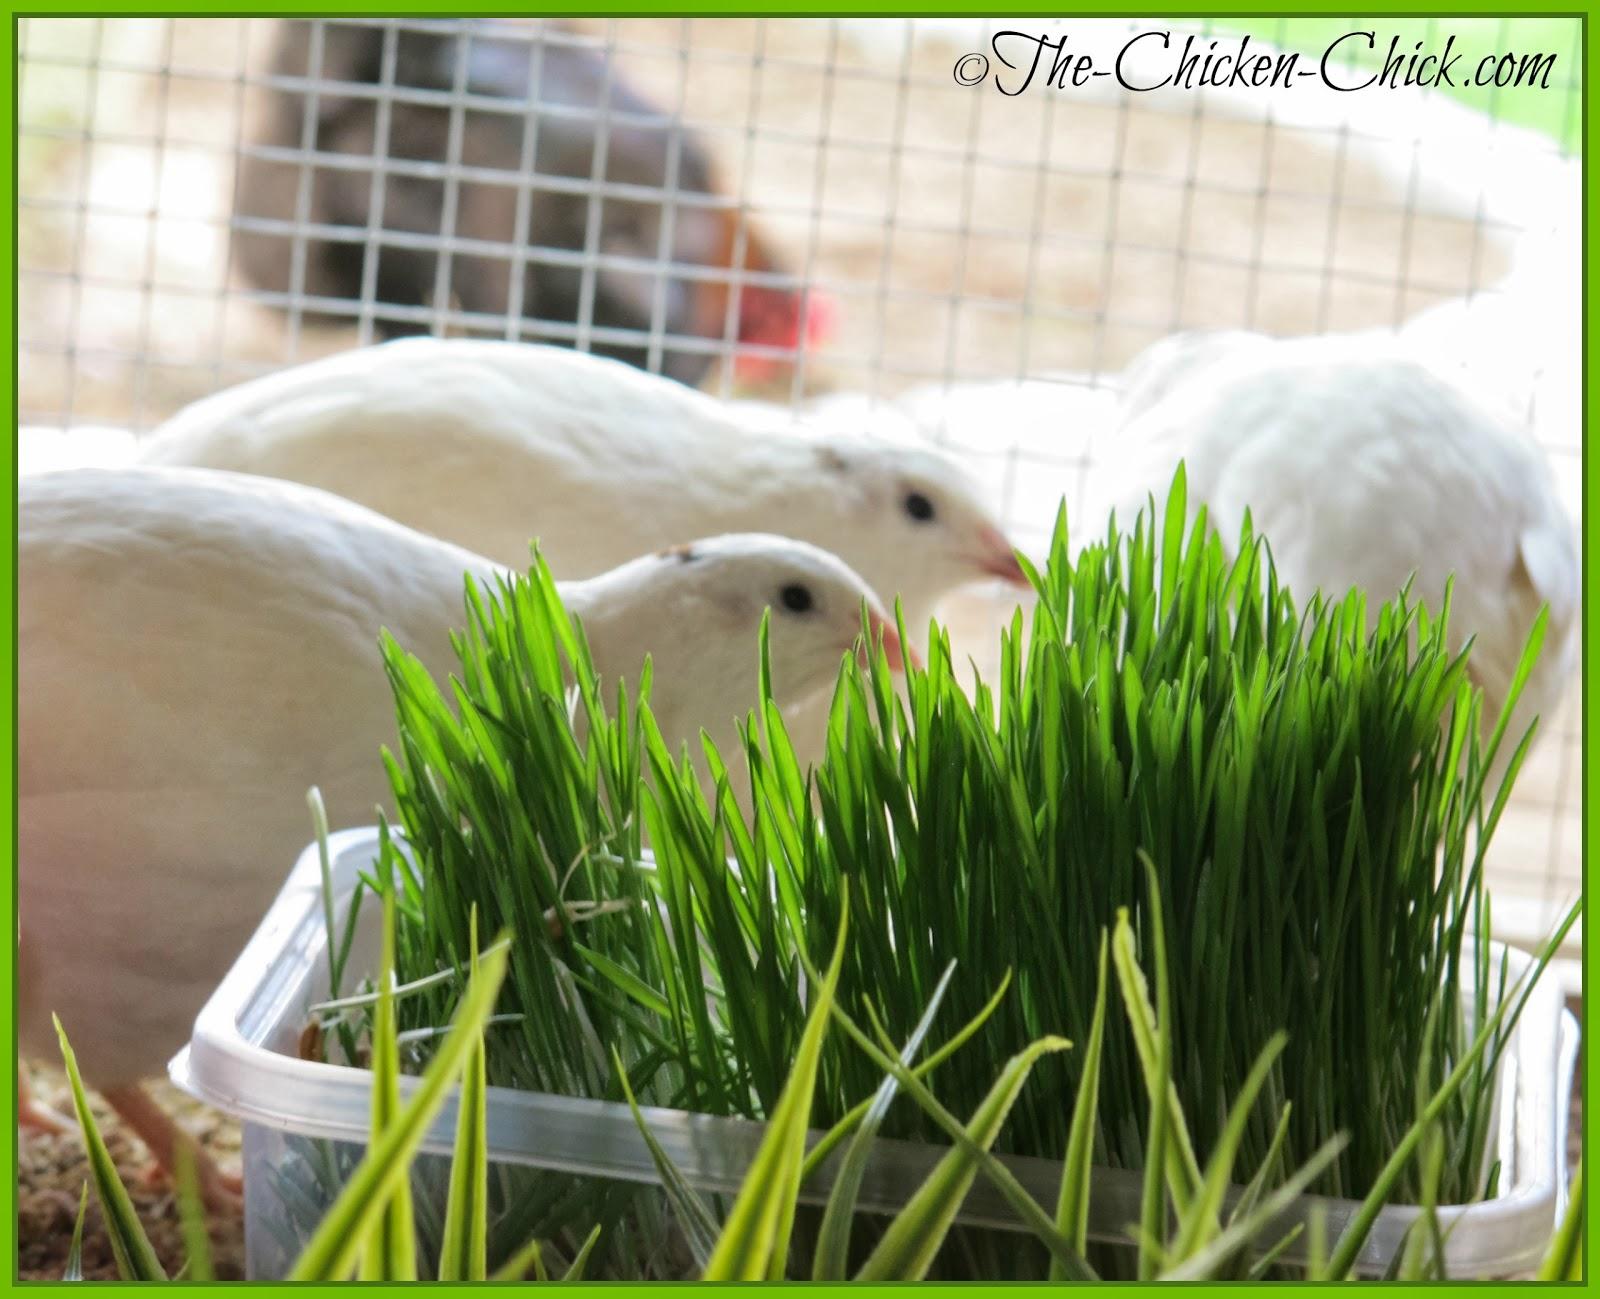 Quail like fodder too!